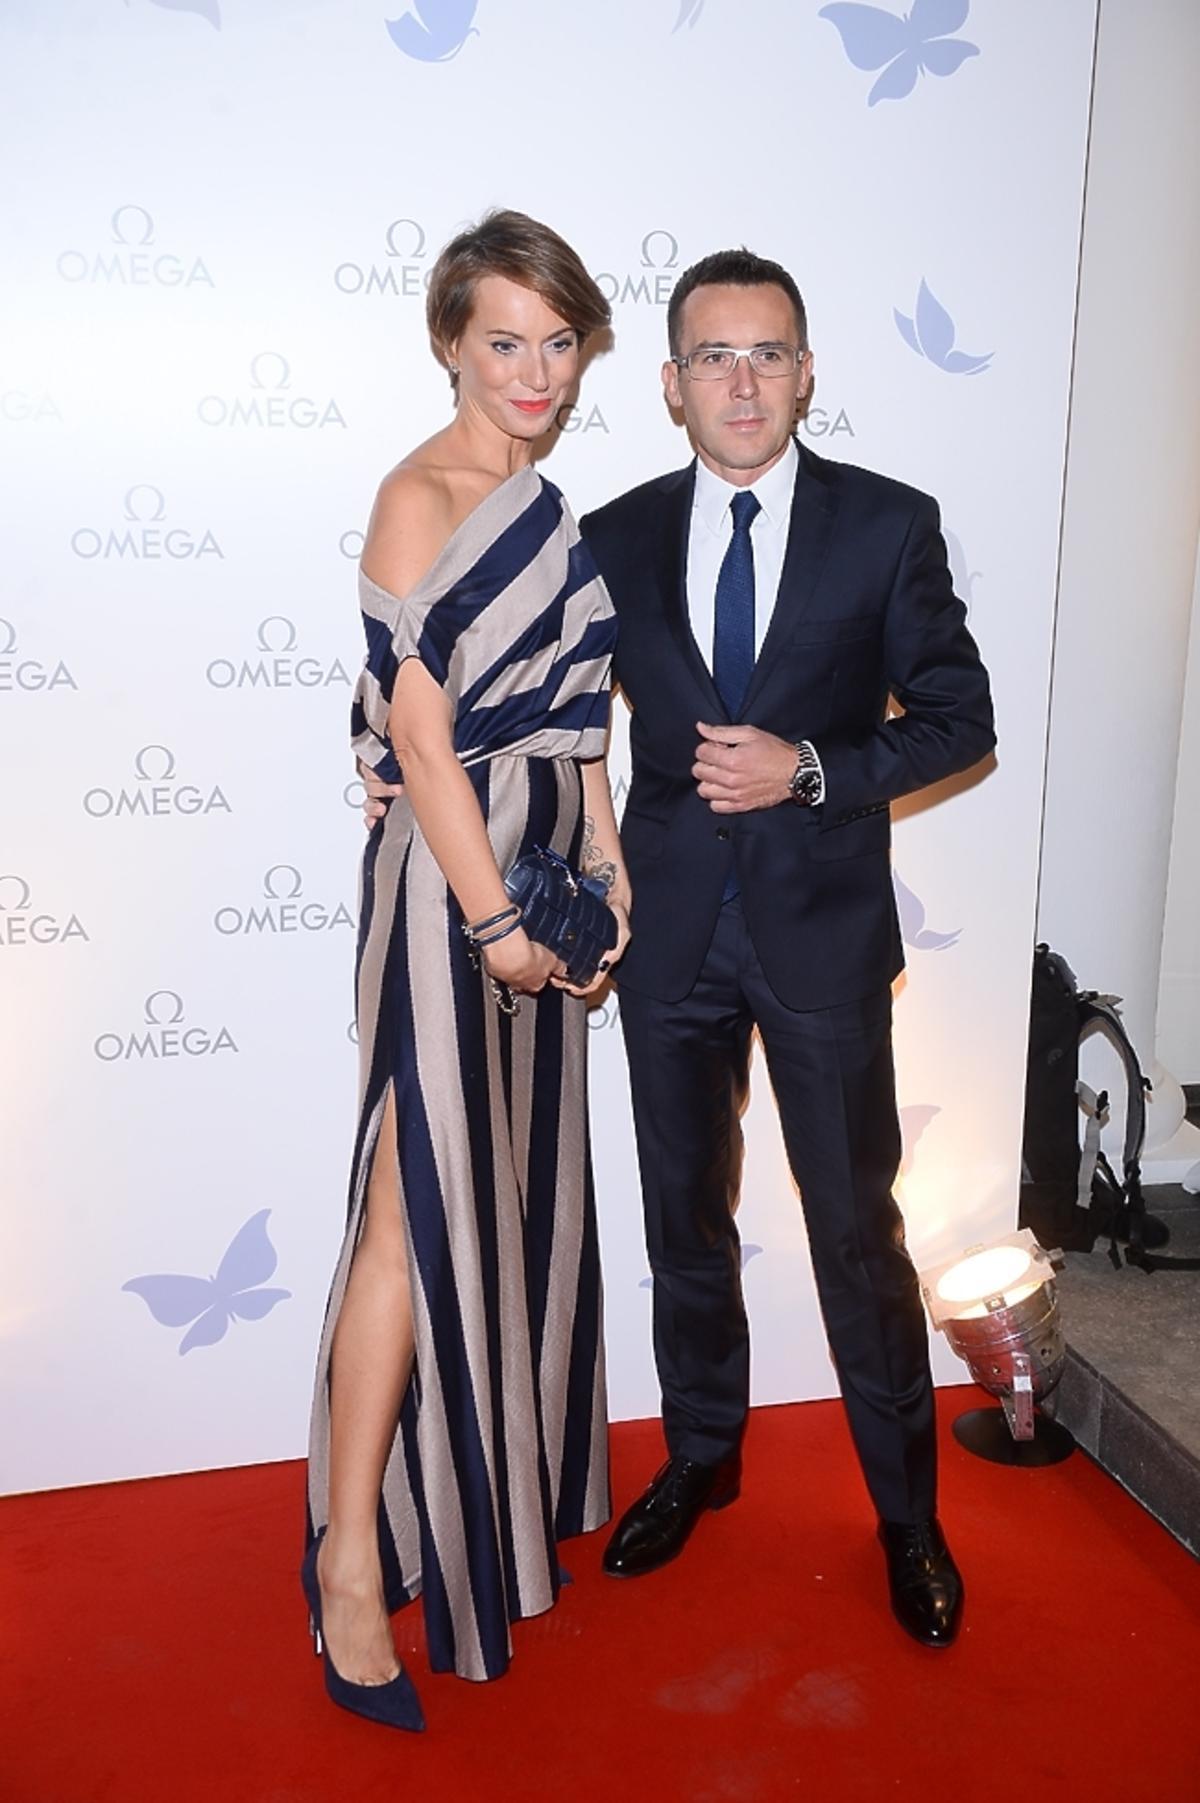 Maciej Kurzajewski i Paulina Smaszcz-Kurzajewska na otwarciu salonu Omega